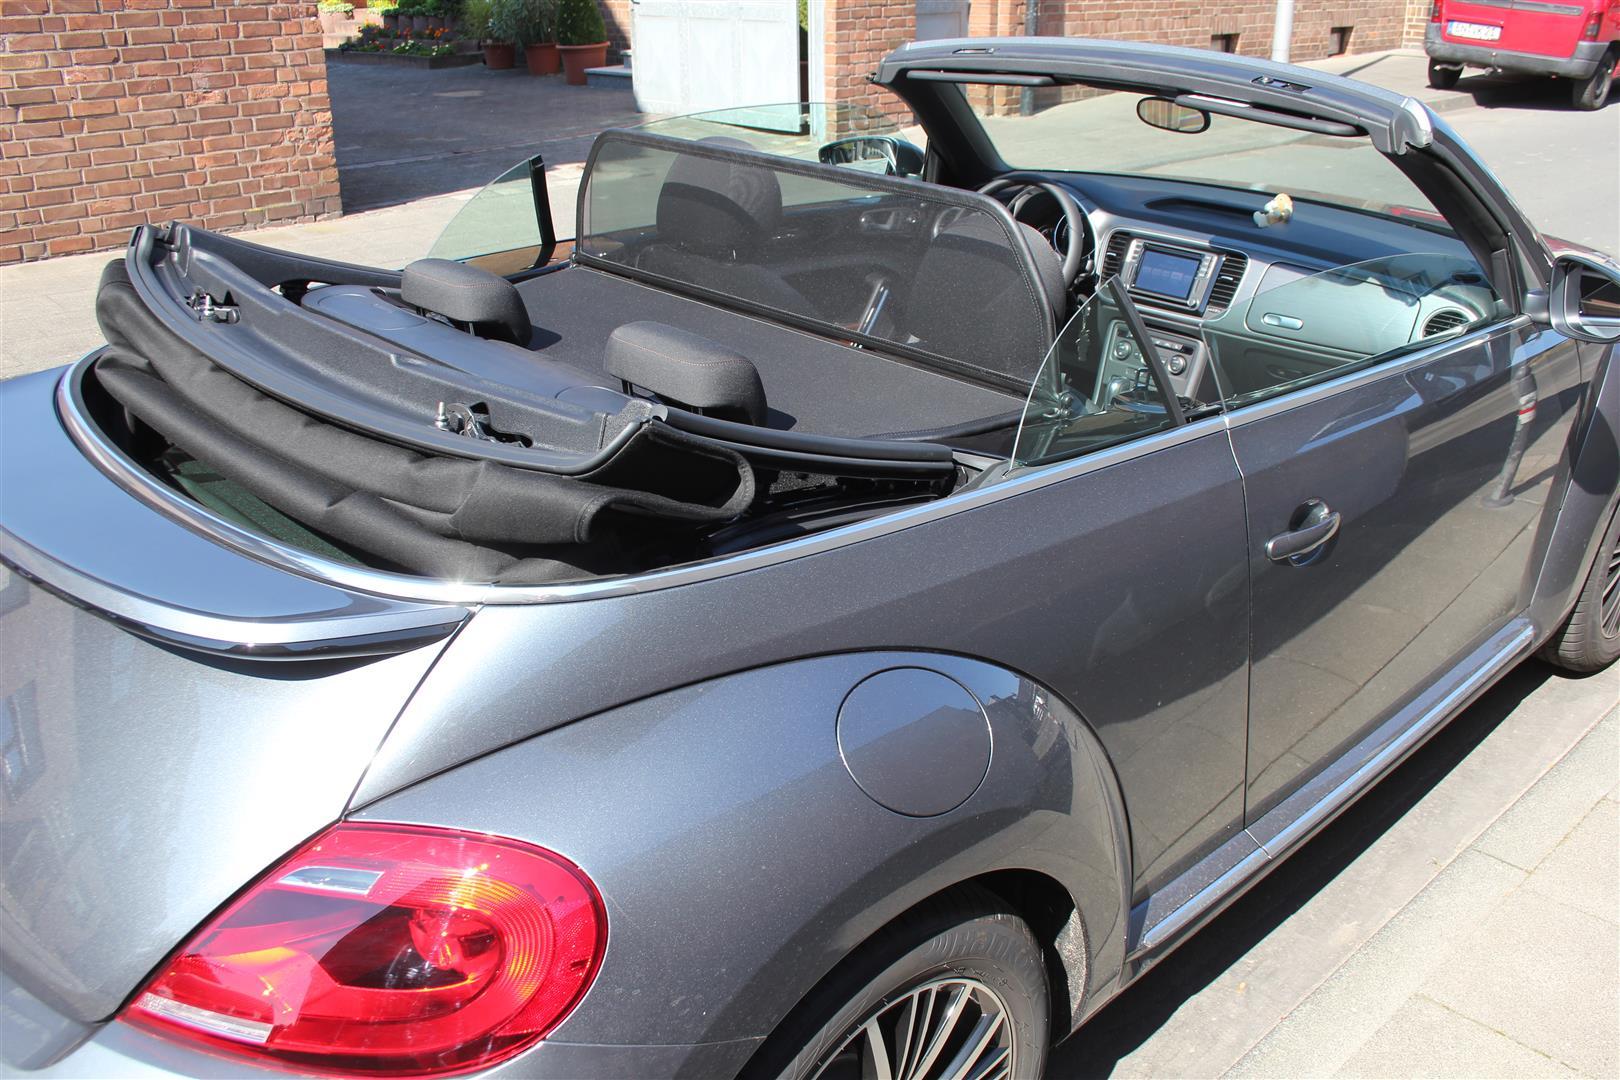 windschott vw beetle cabriolet 5c7 ab baujahr 2015 schwarz. Black Bedroom Furniture Sets. Home Design Ideas